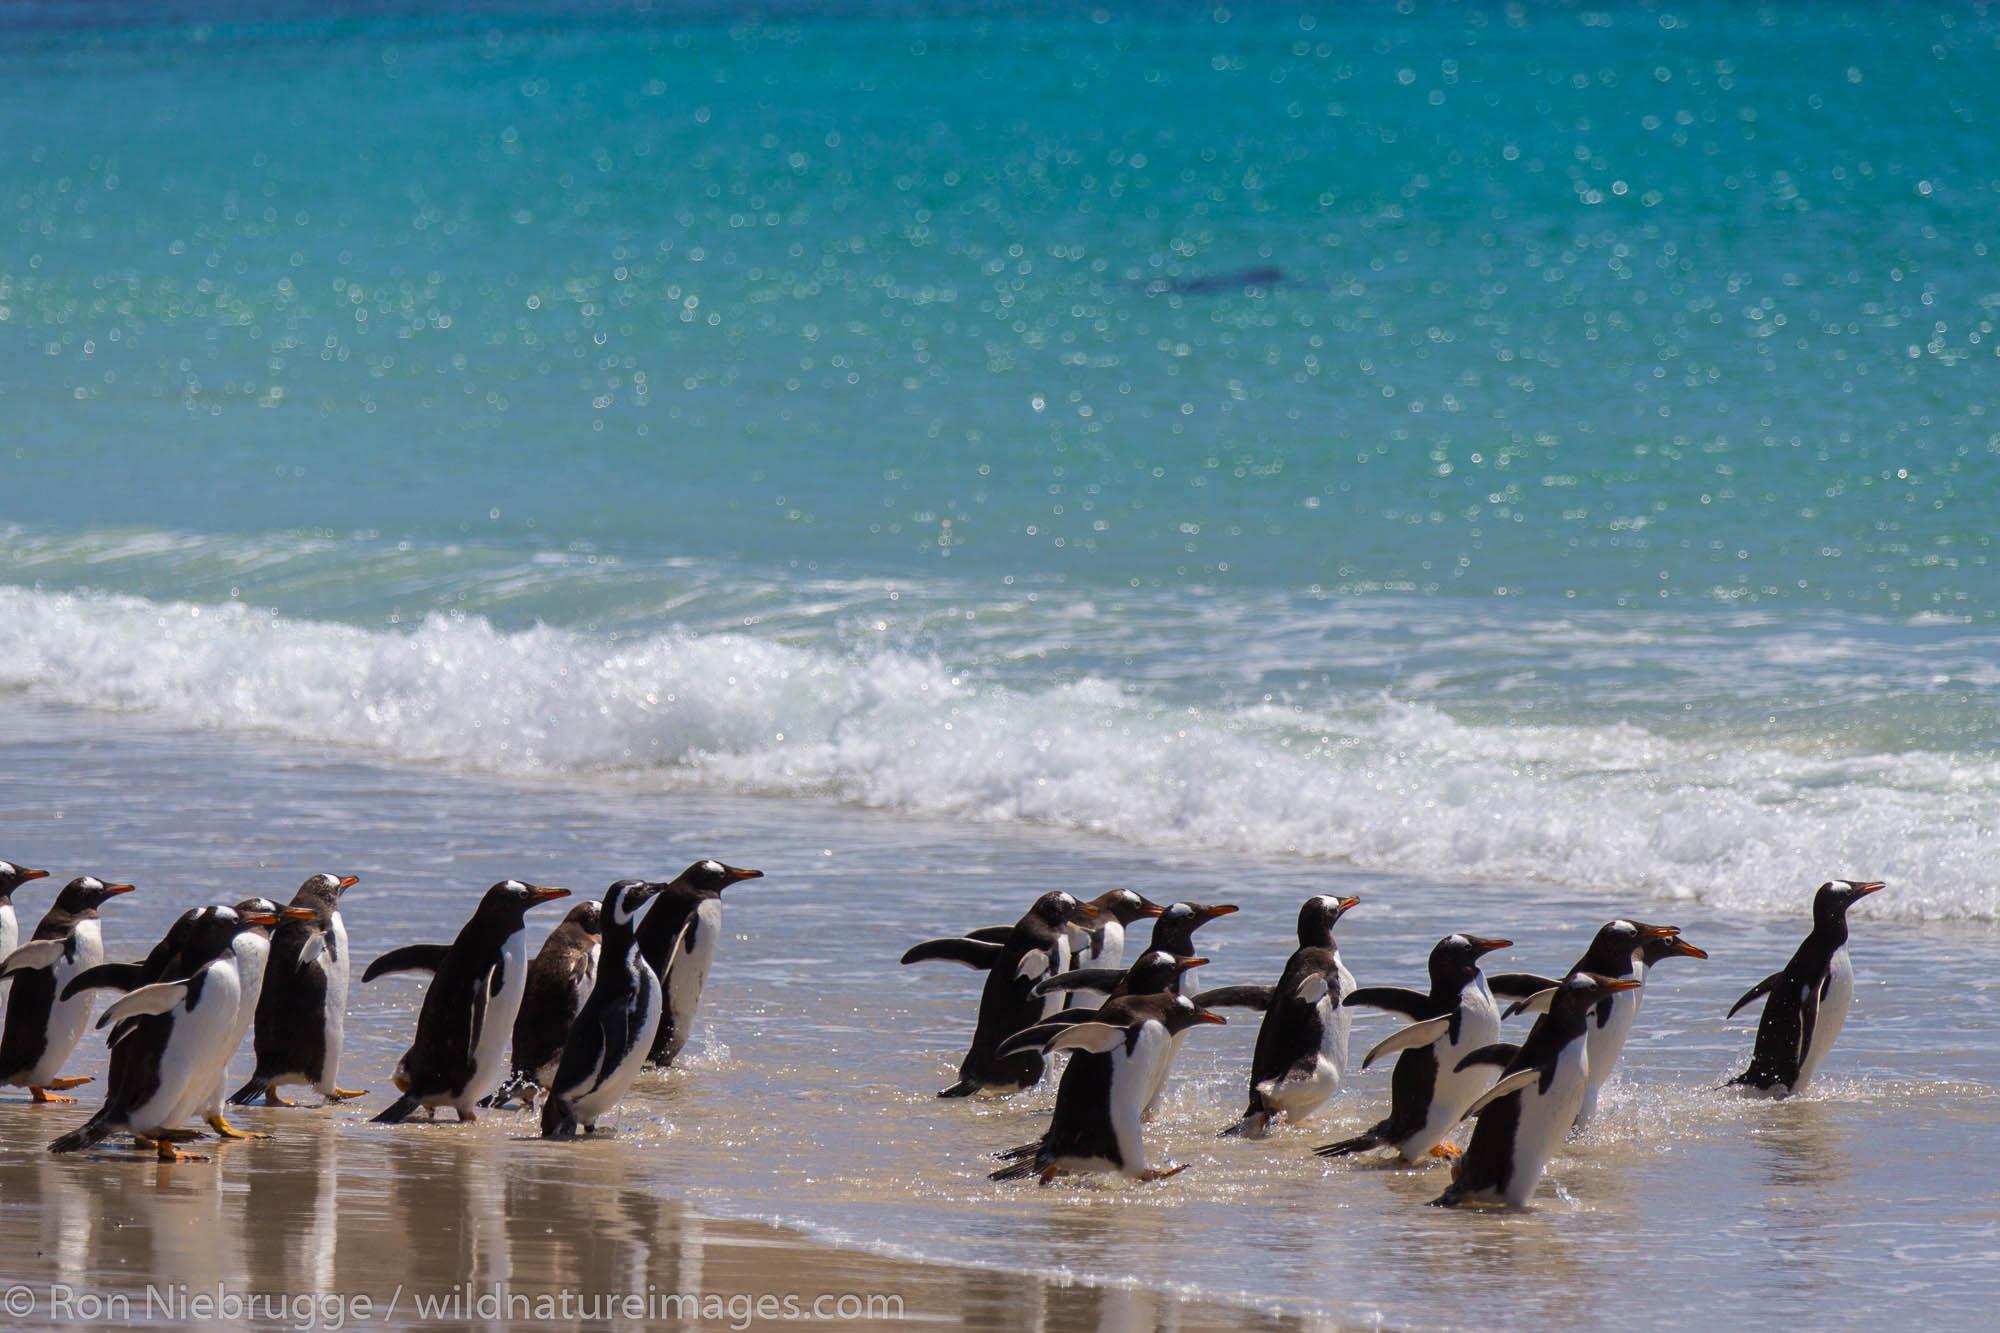 Gentoo and Magellanic penguins, New Island, Falkland Islands.